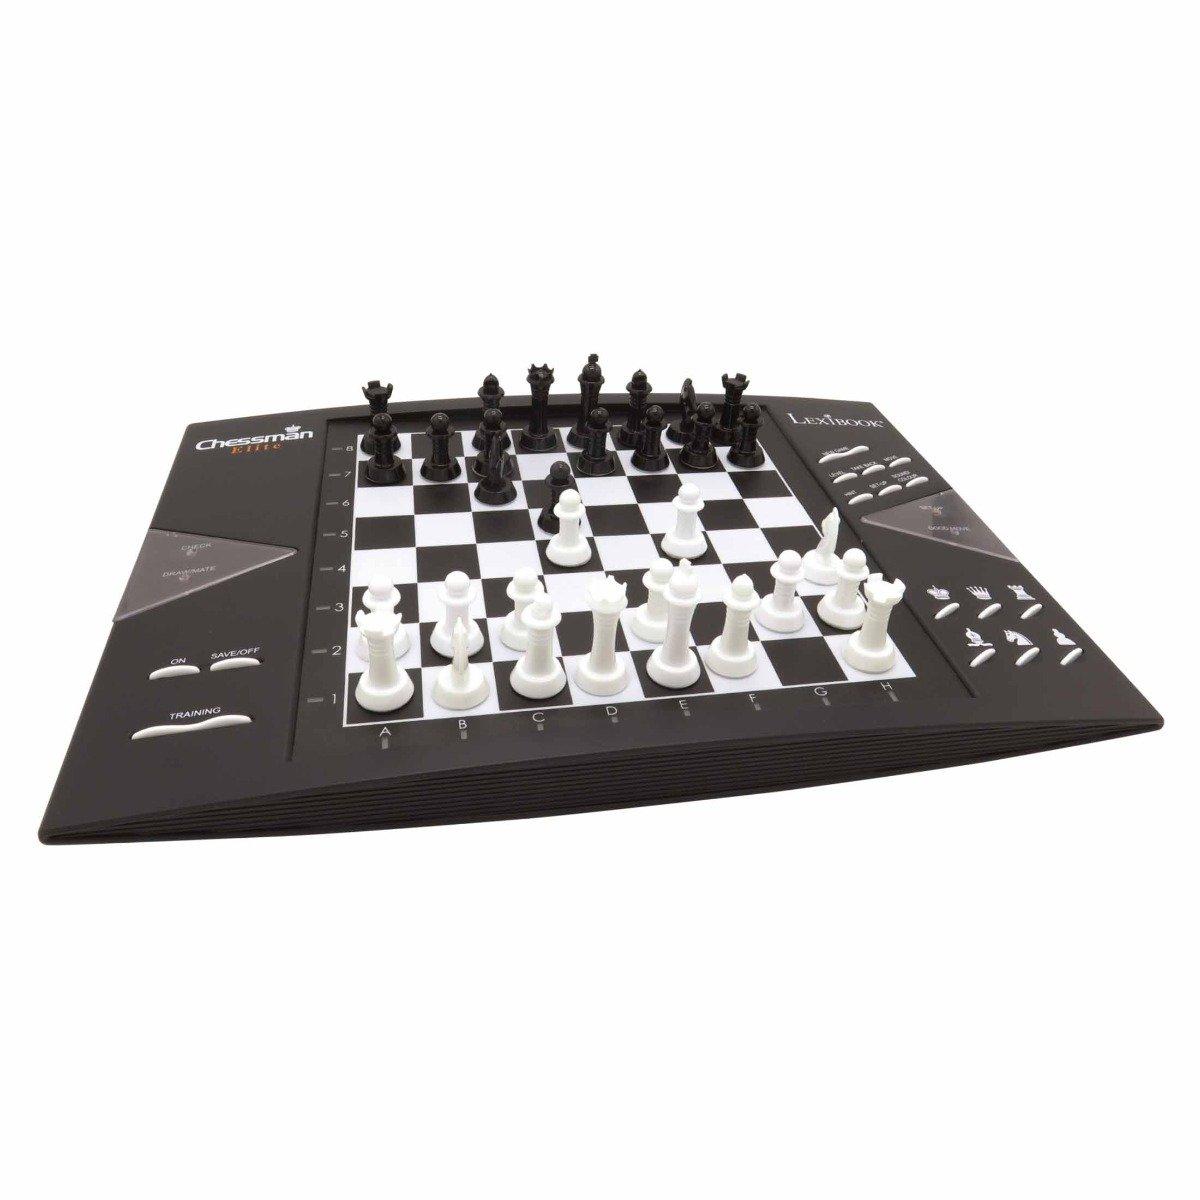 Jucarie interactiva Lexibook, Sah electronic ChessMan Elite